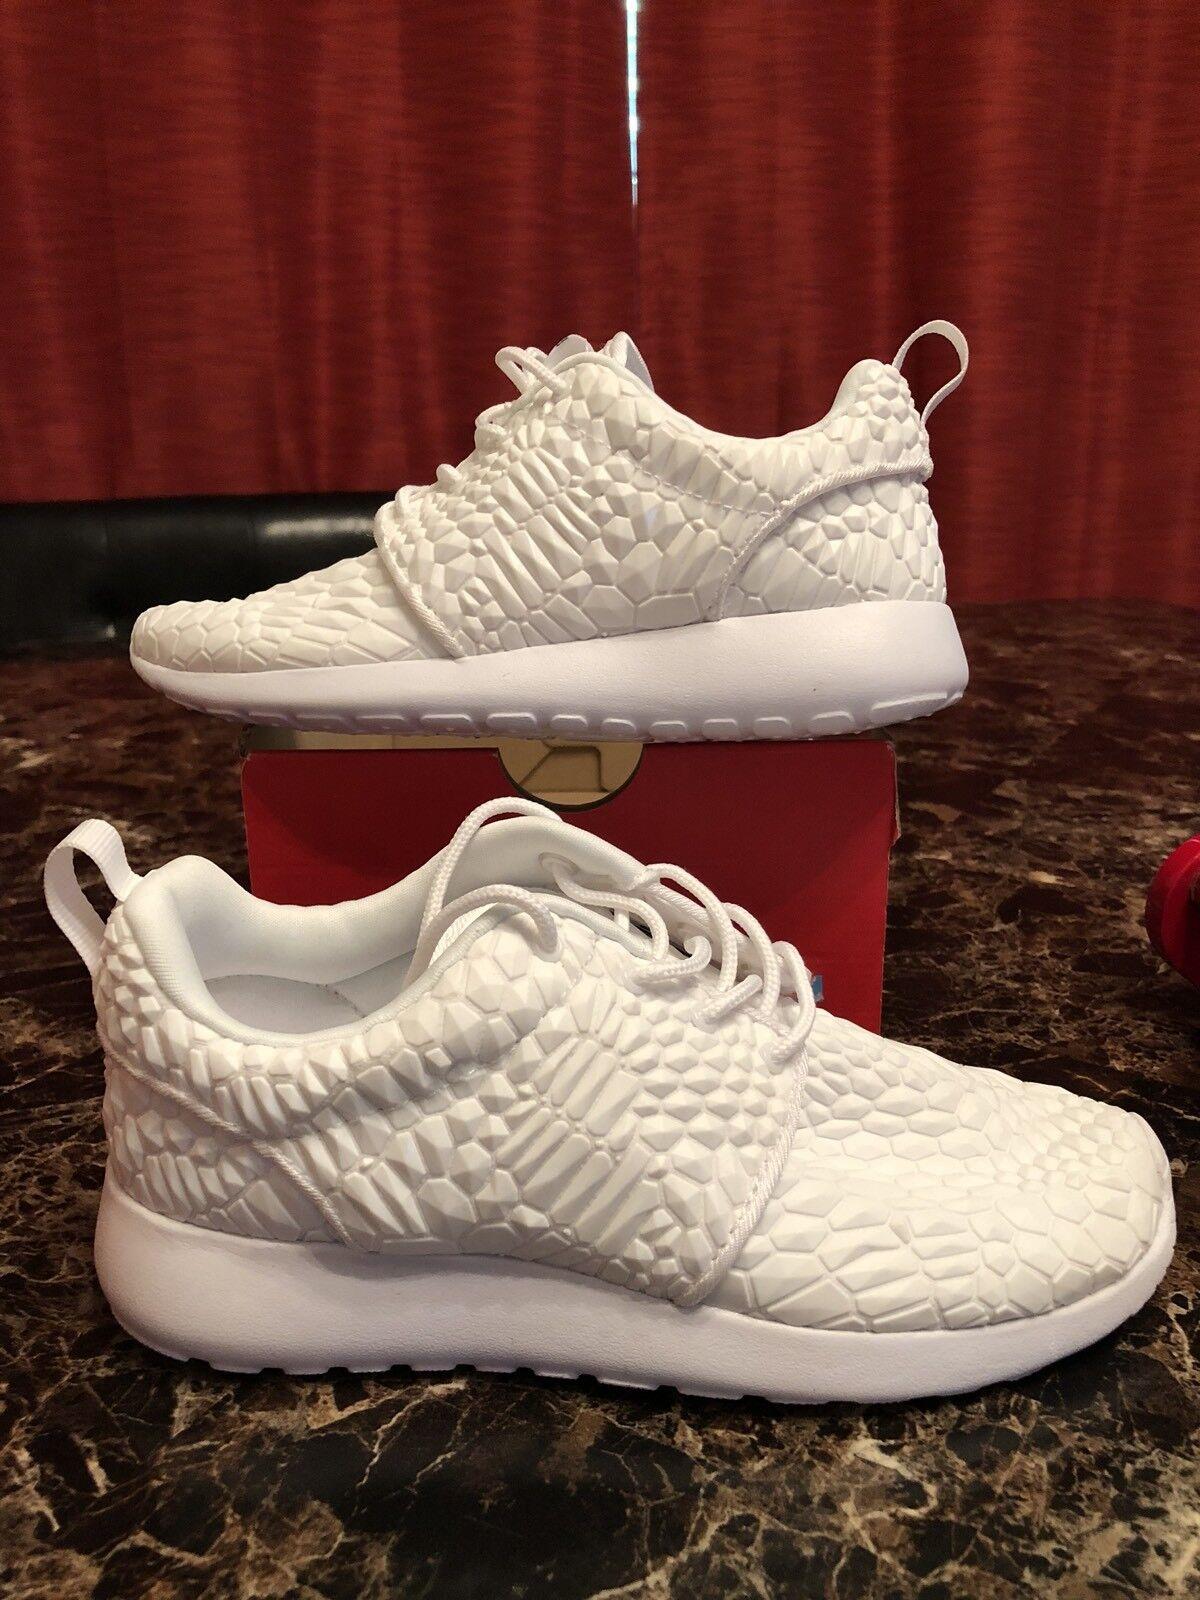 Nike Roshe One DMB White On White Diamondback  807460-600 Womens size 5